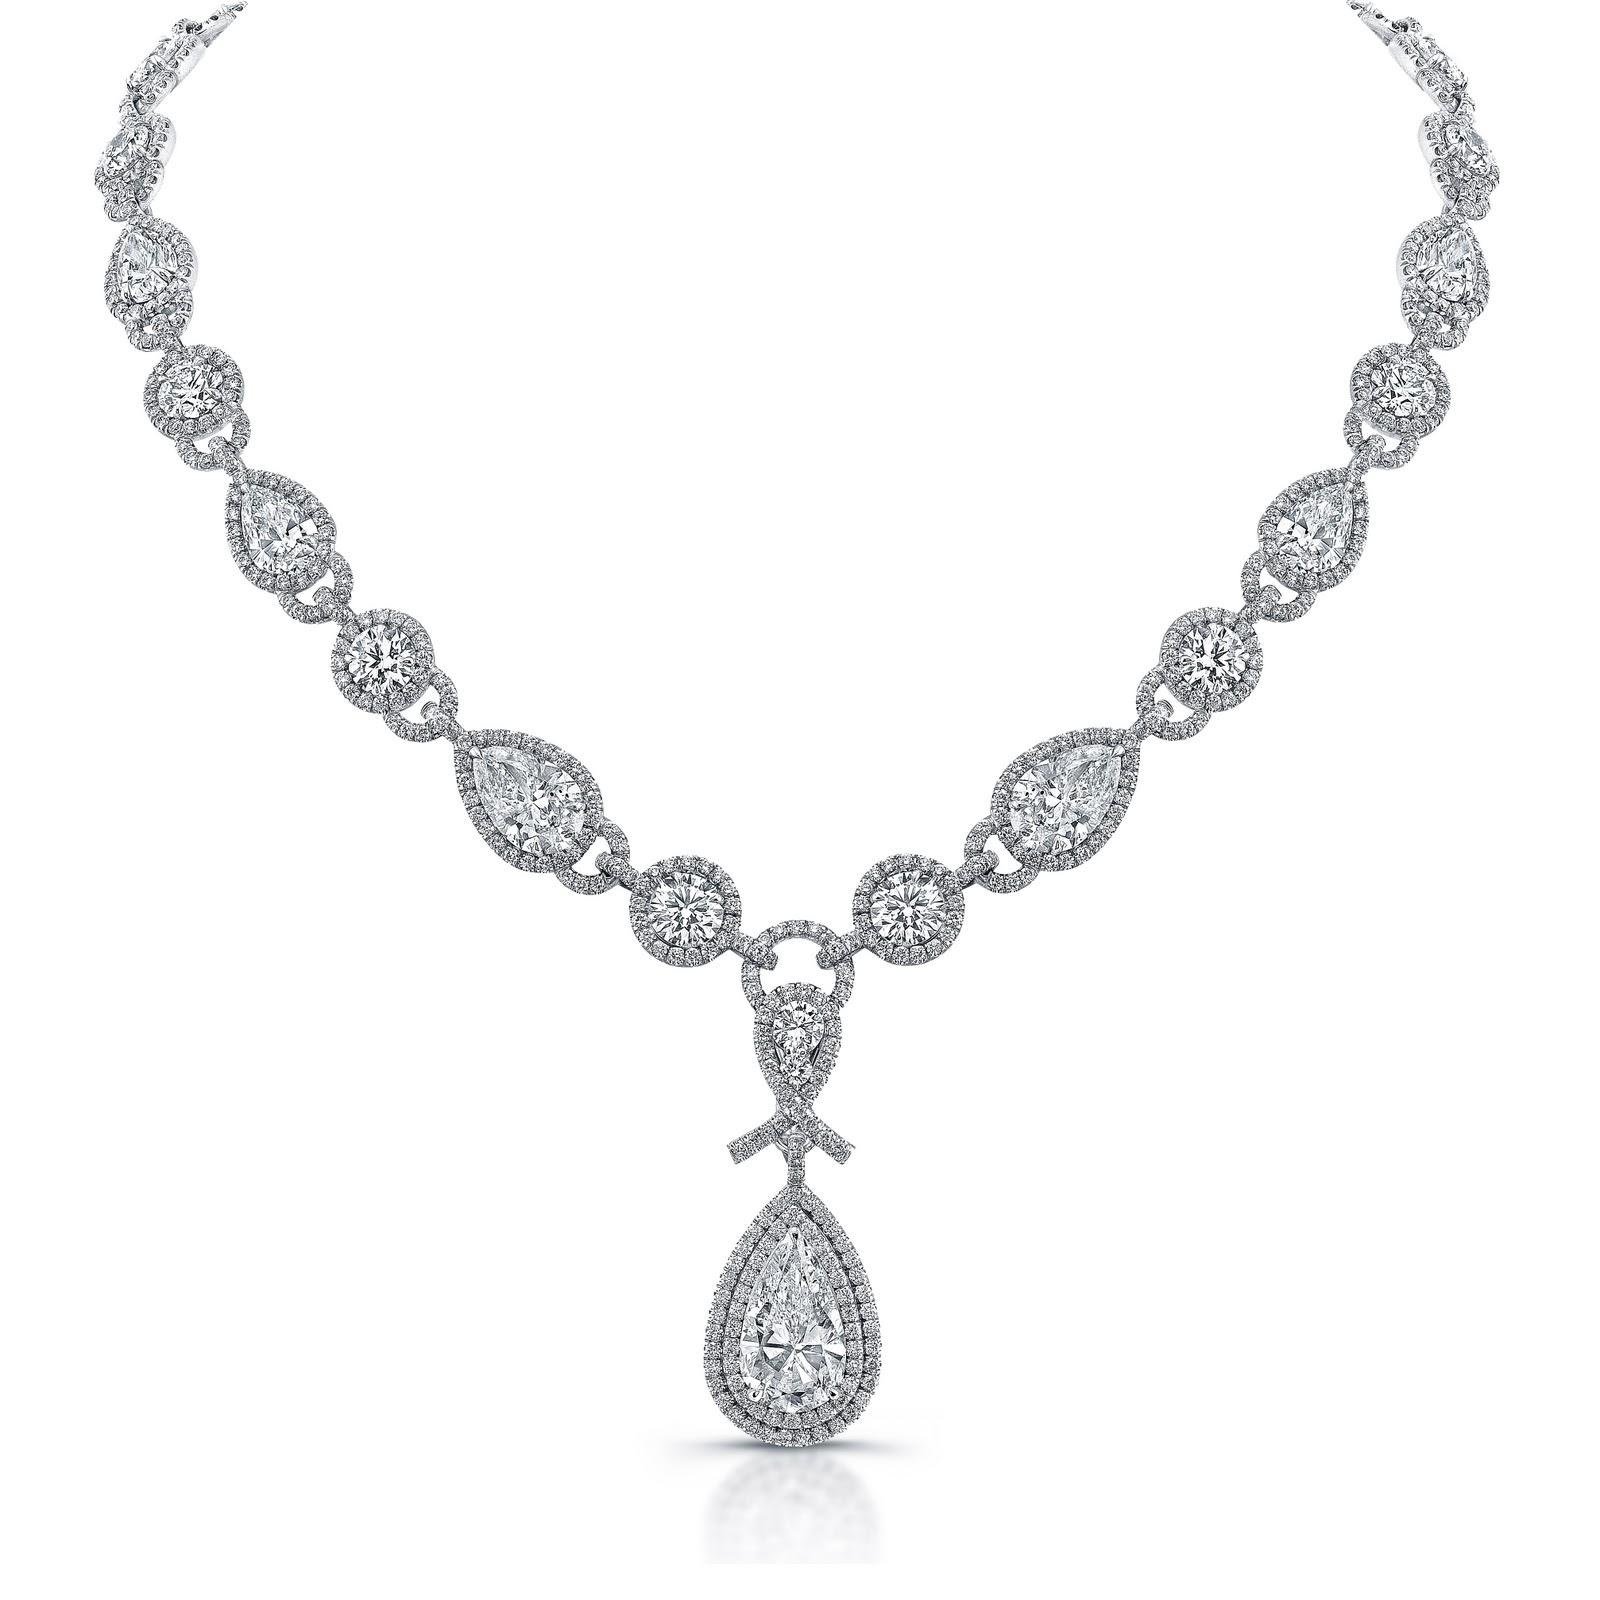 jewelry news network centurion 2011 jewelry design winners